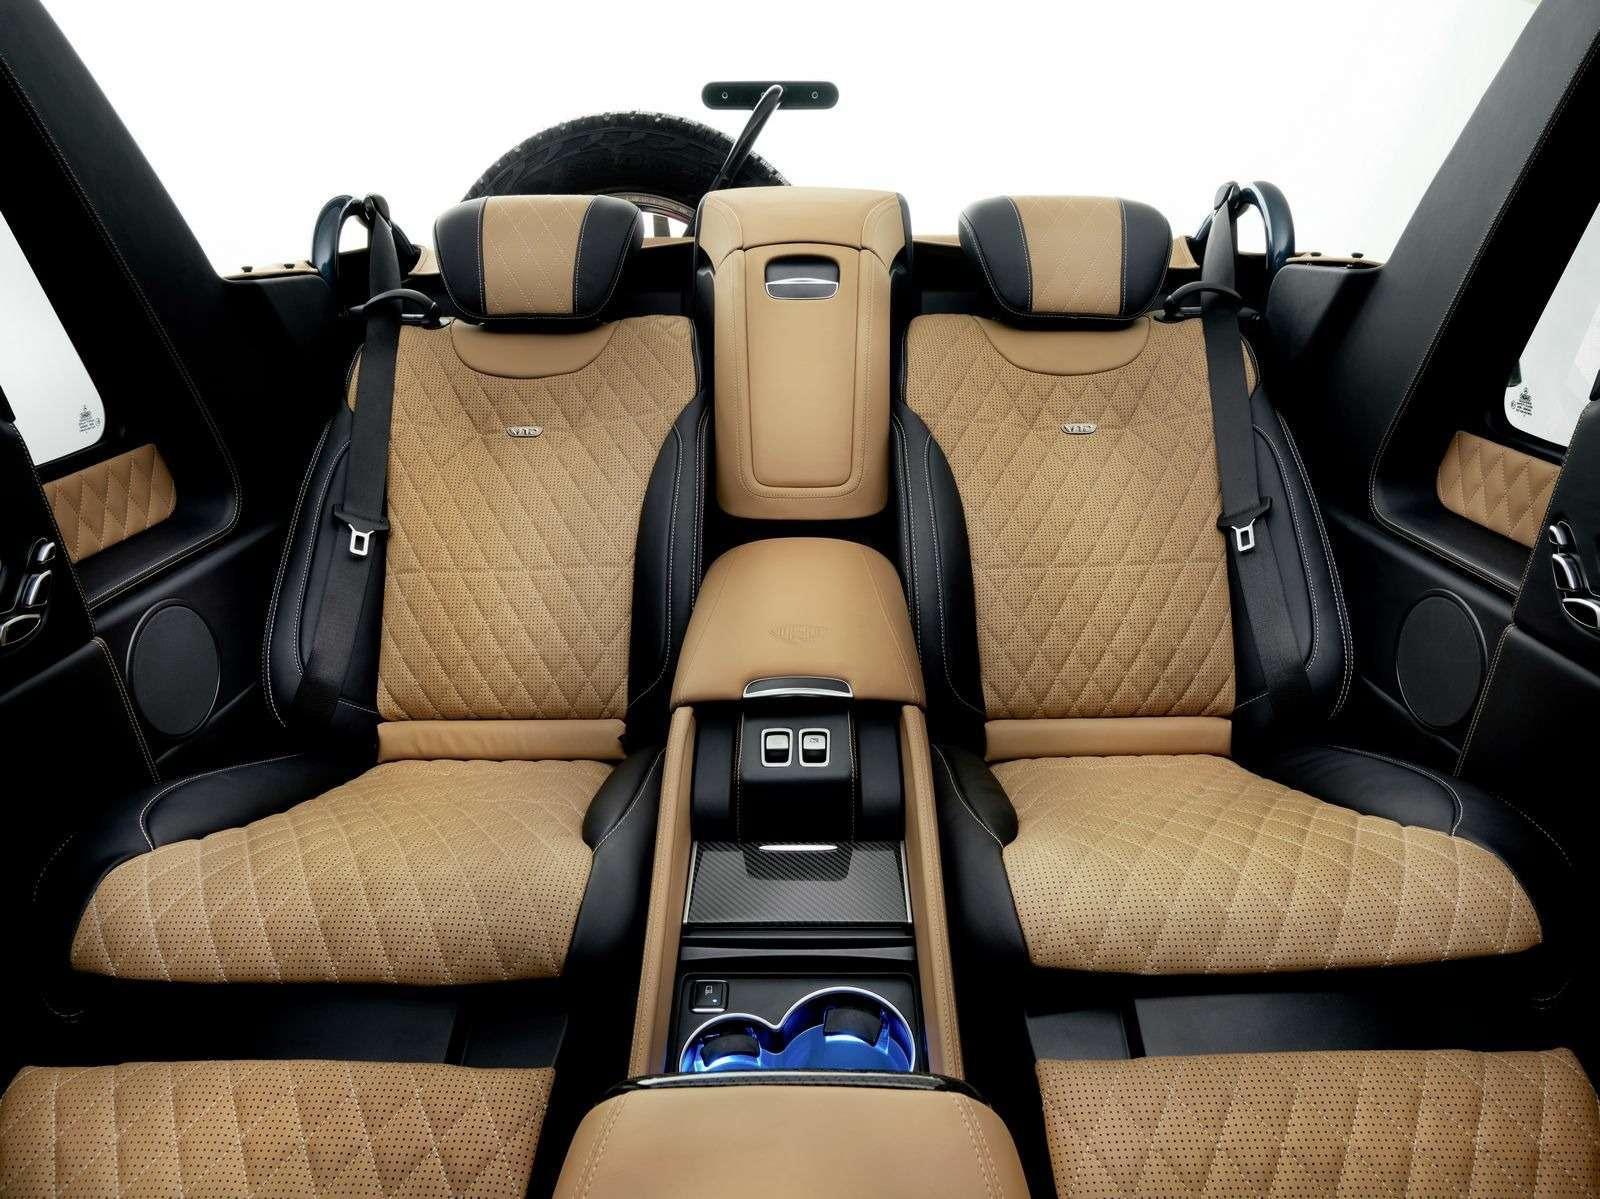 Mercedes-Maybach представил люксовый кабриолет G-класса— фото 706744